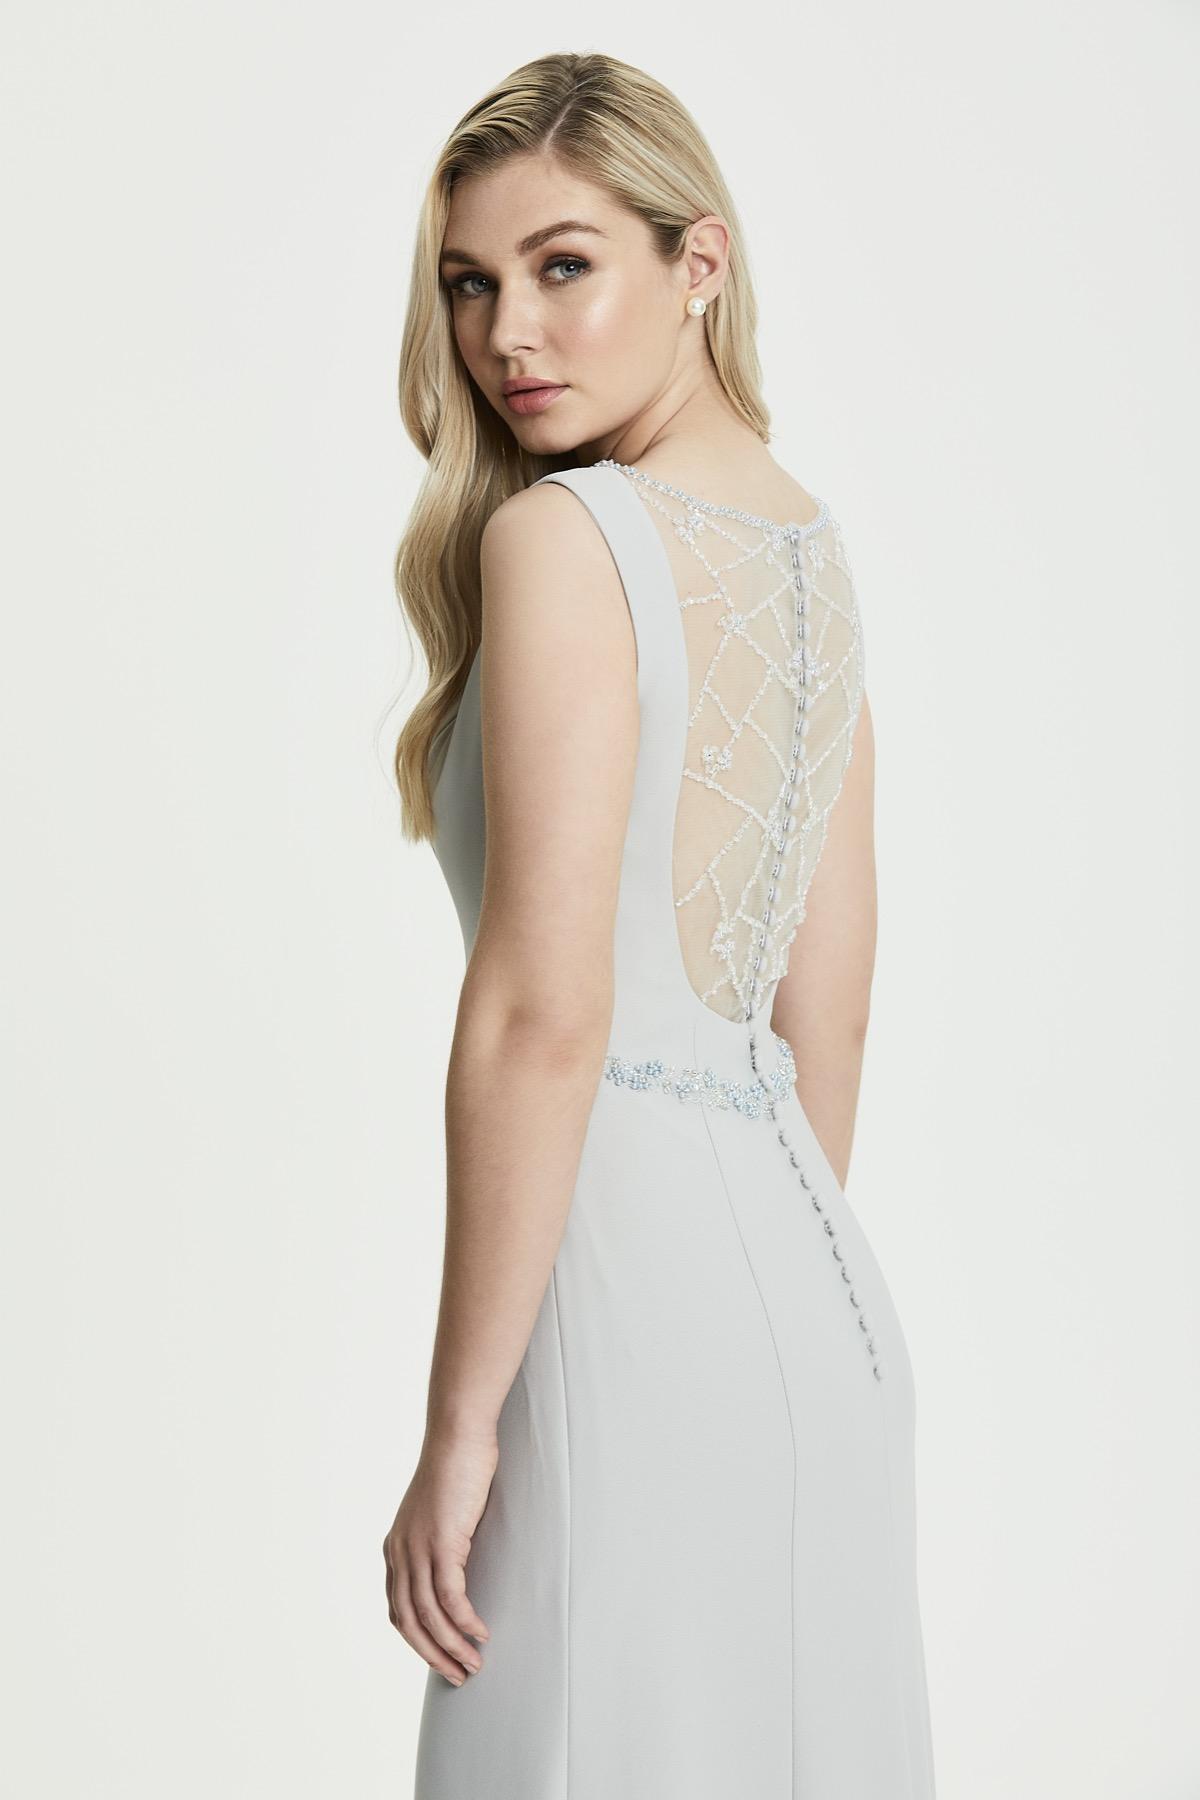 Bridesmaid Dresses By Ebony Rose Romantique Bridal